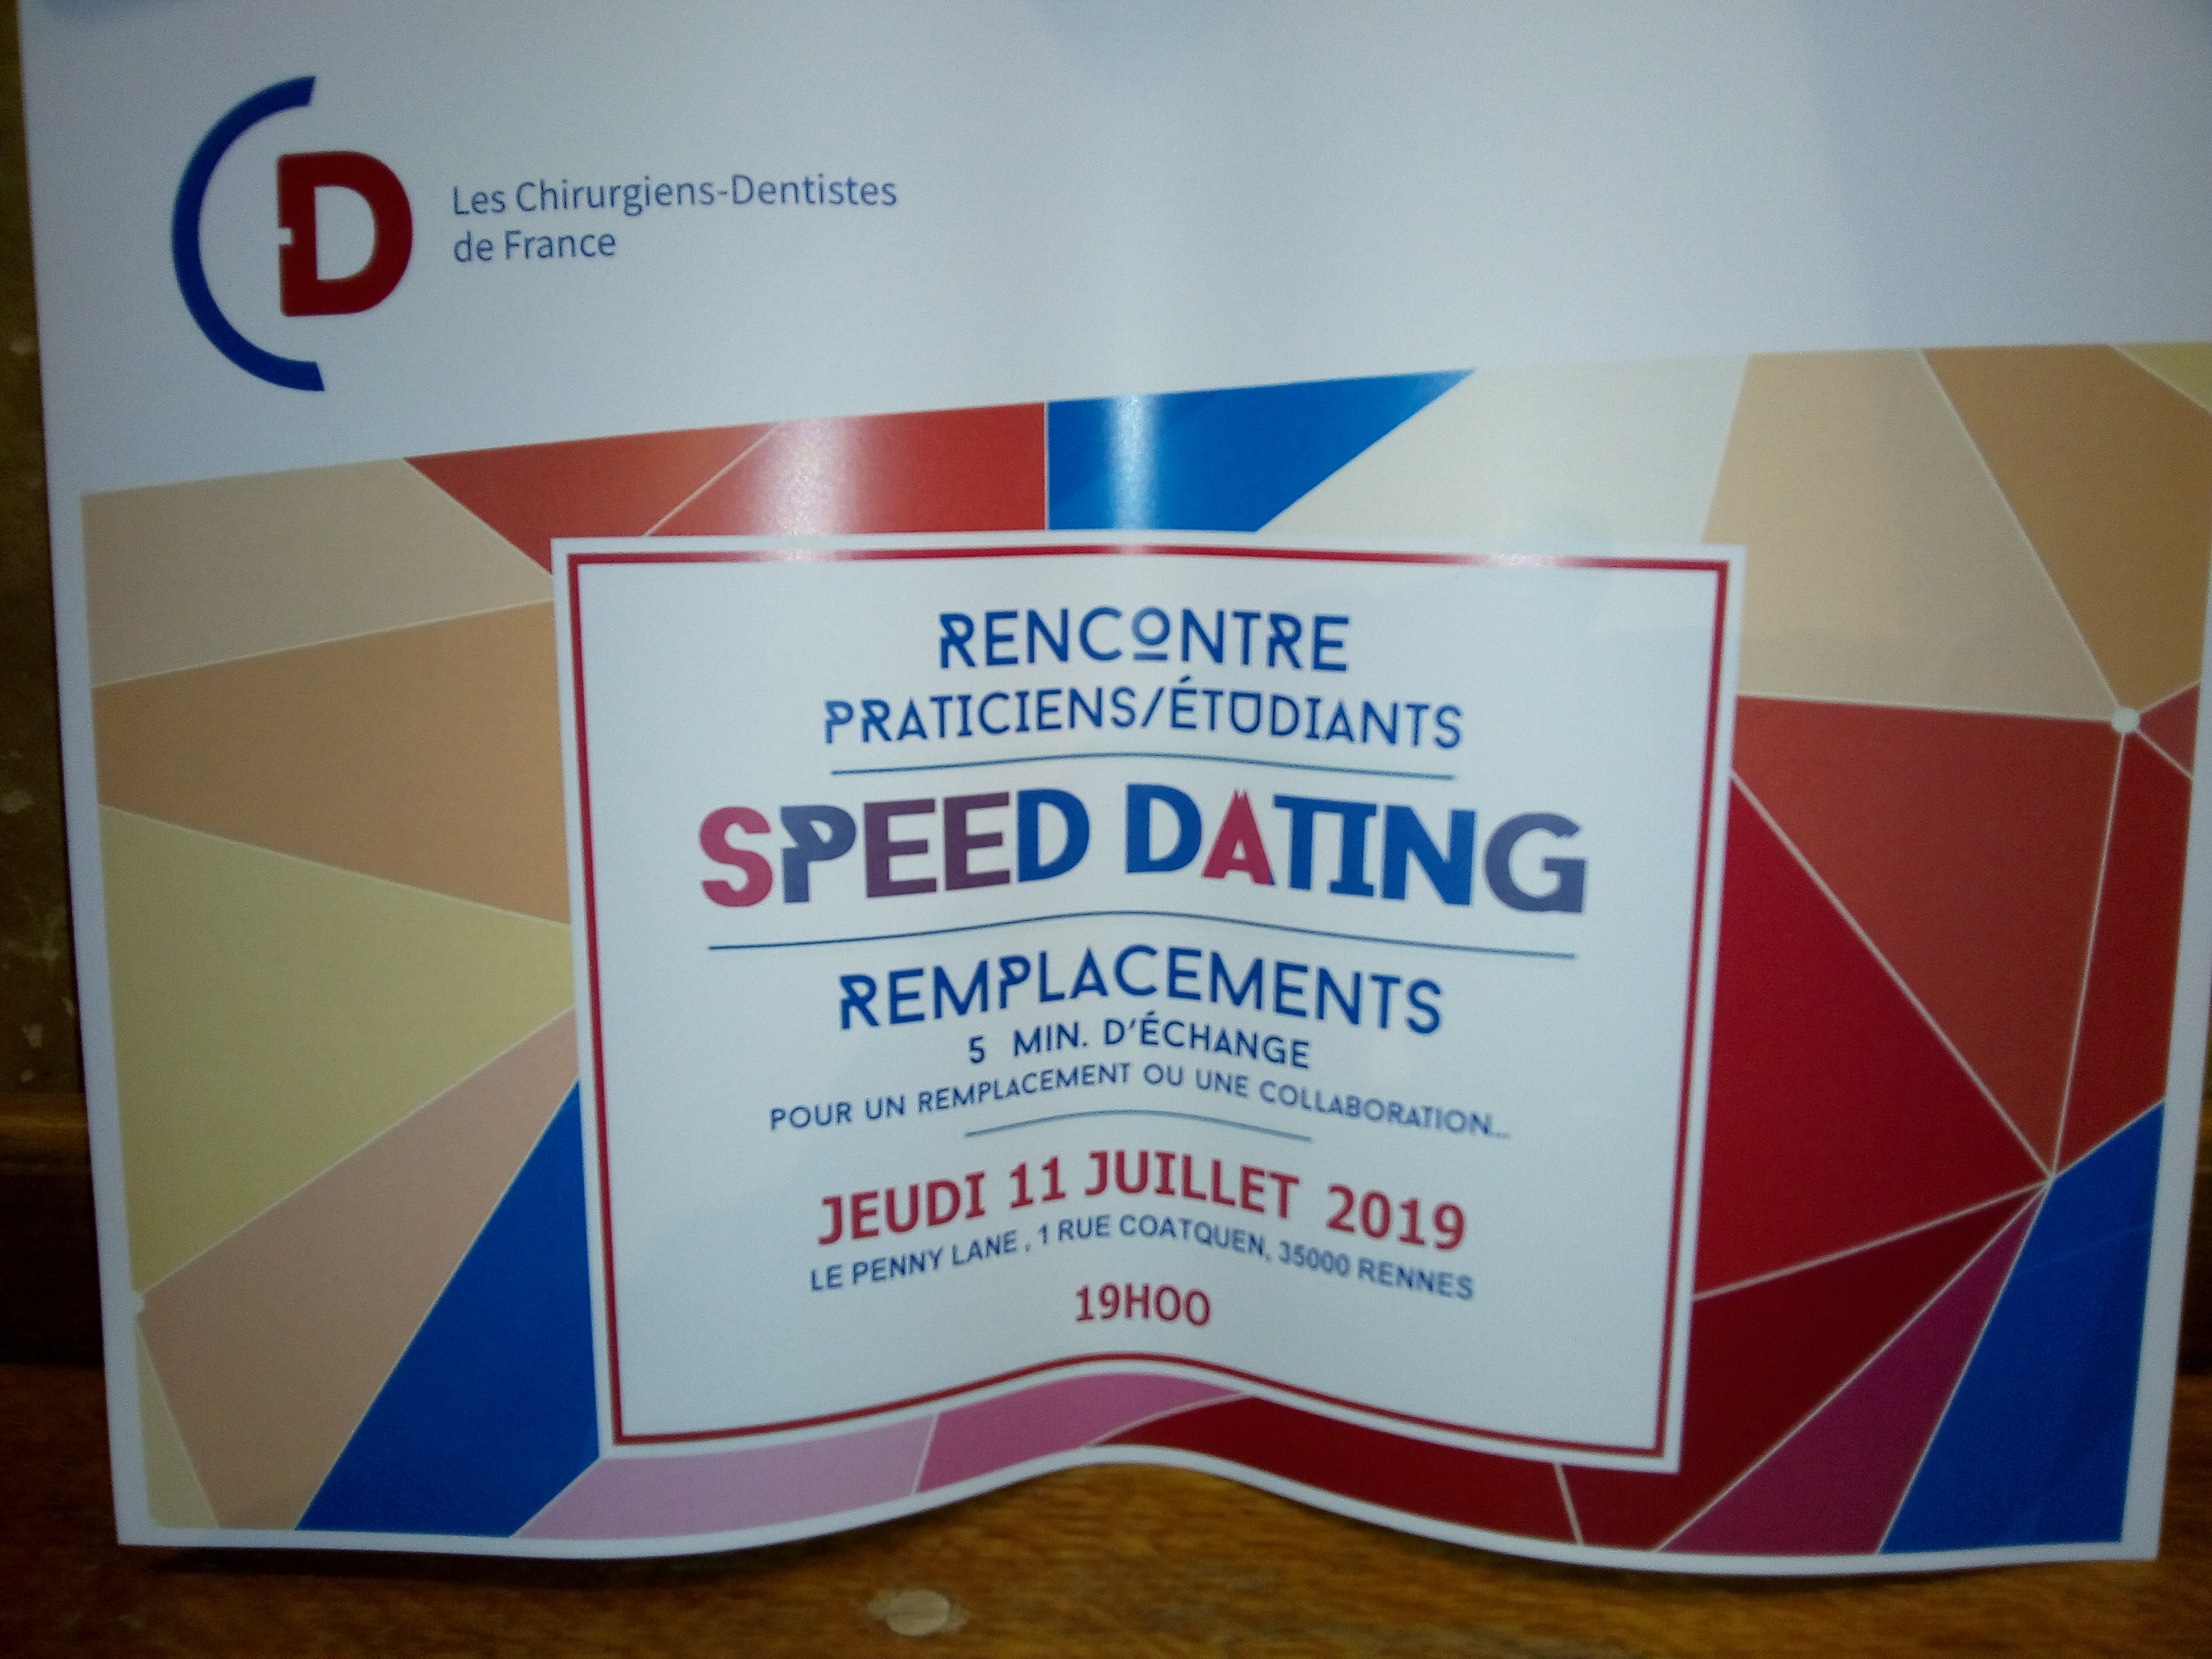 speed dating etudiant rennes